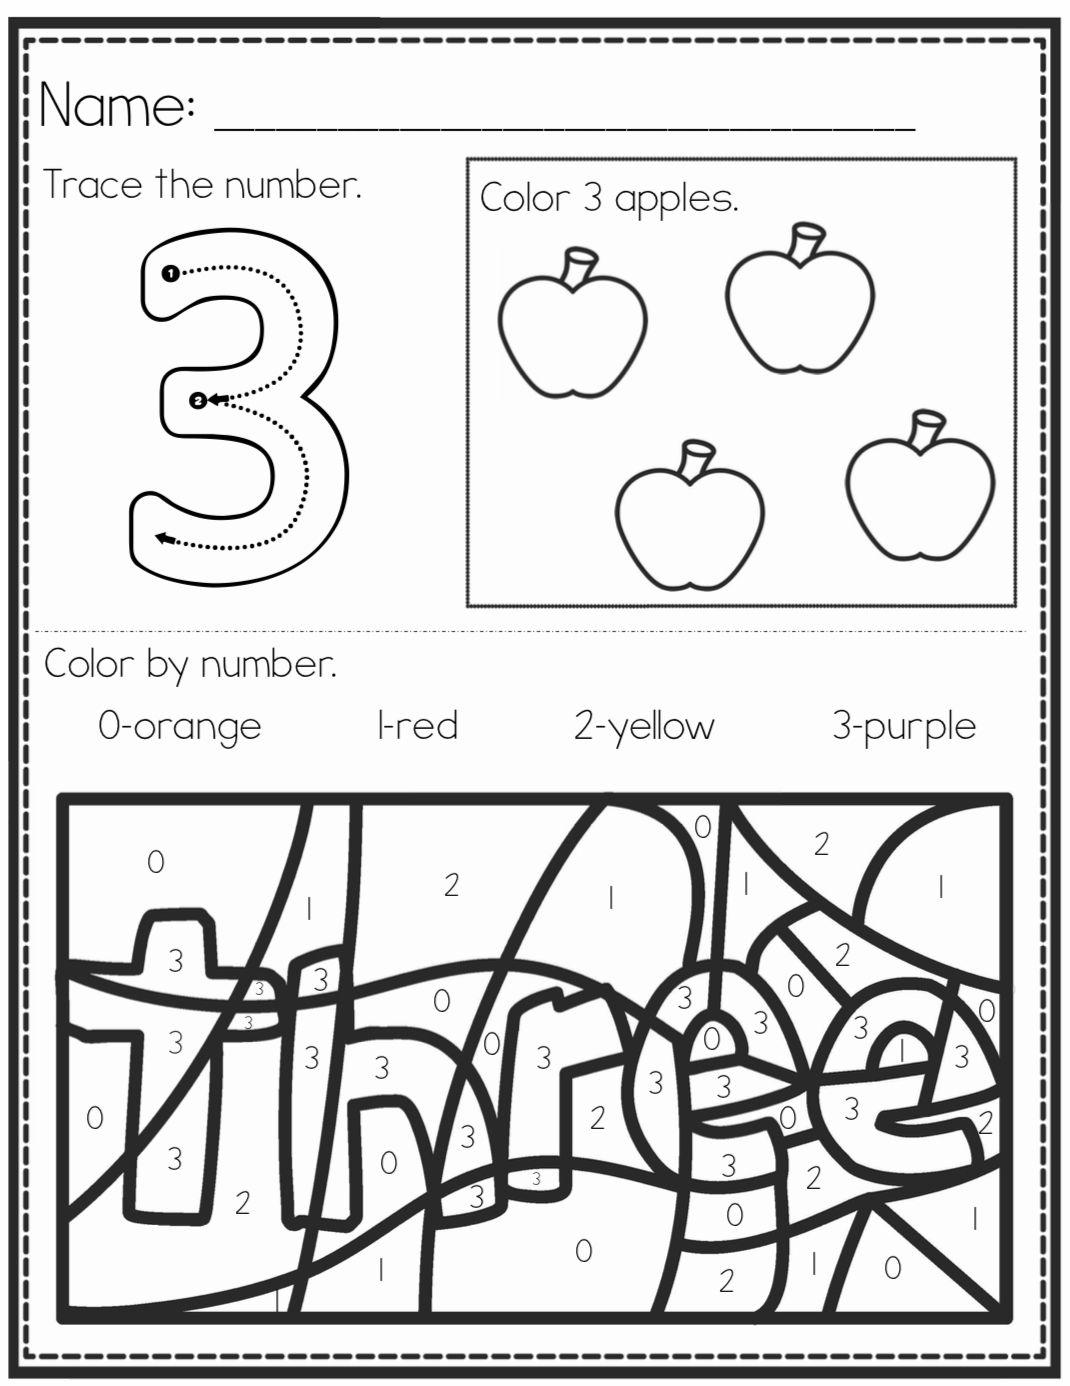 Pin By Daichengjung On Preschool Ideas